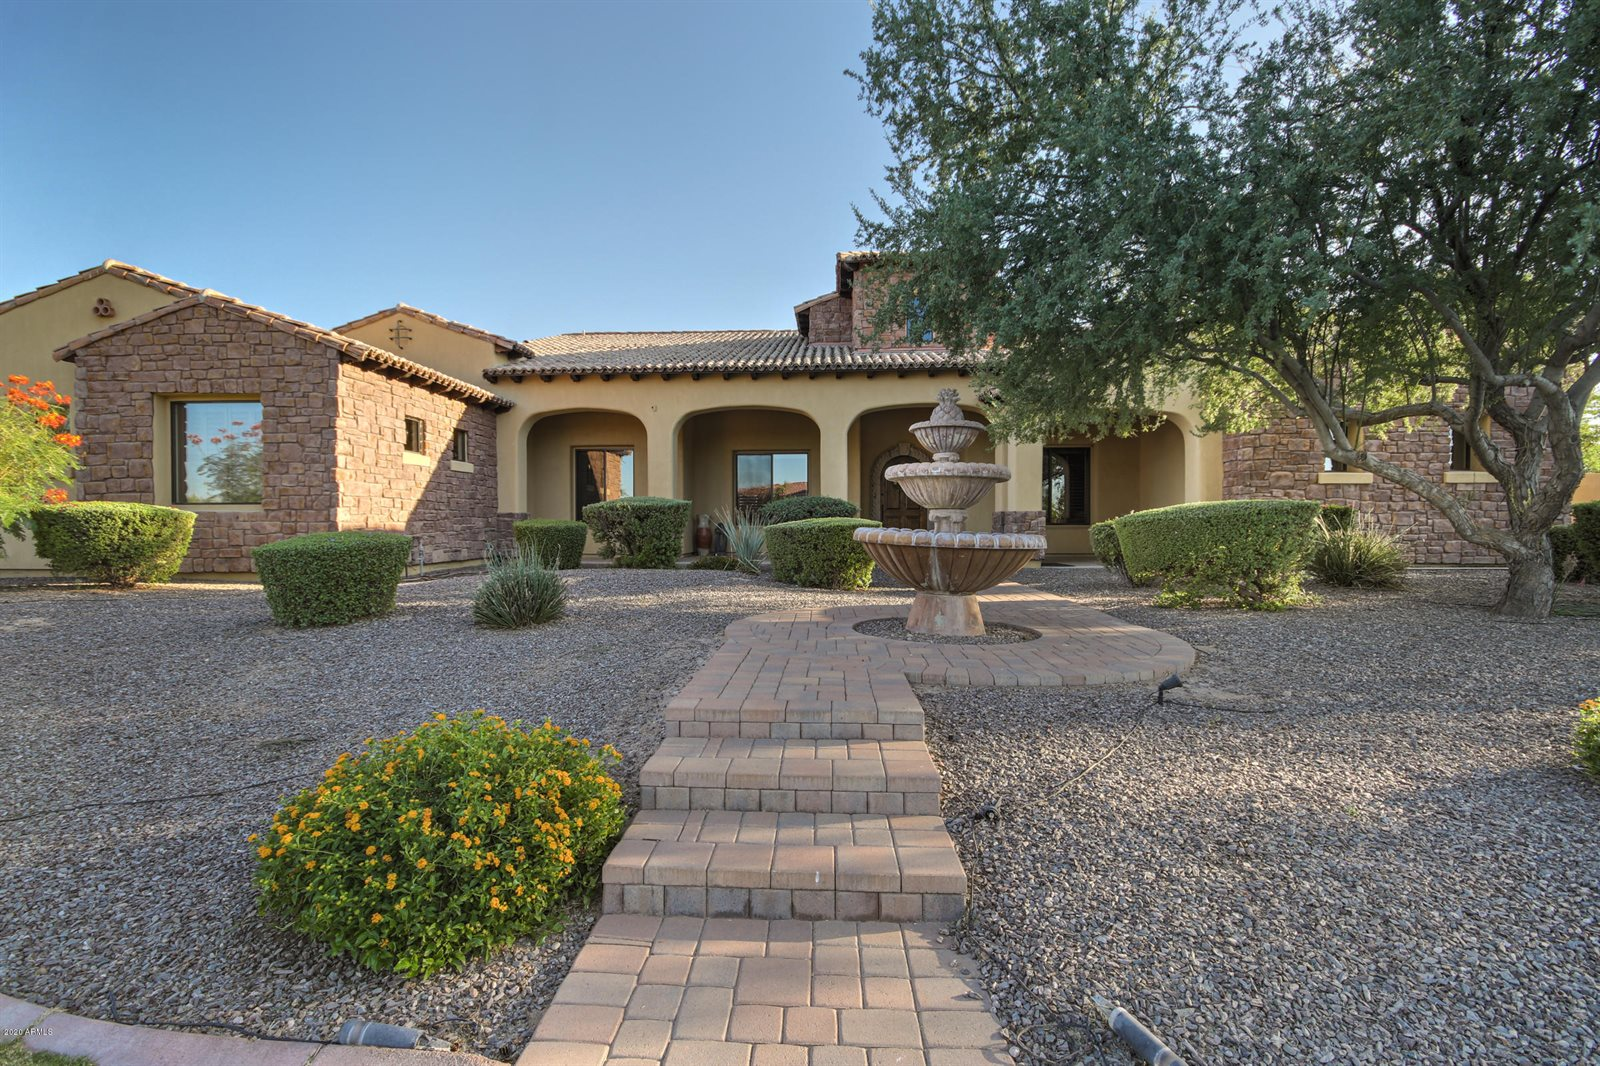 18541 East Mary Ann Way, Queen Creek, AZ 85142